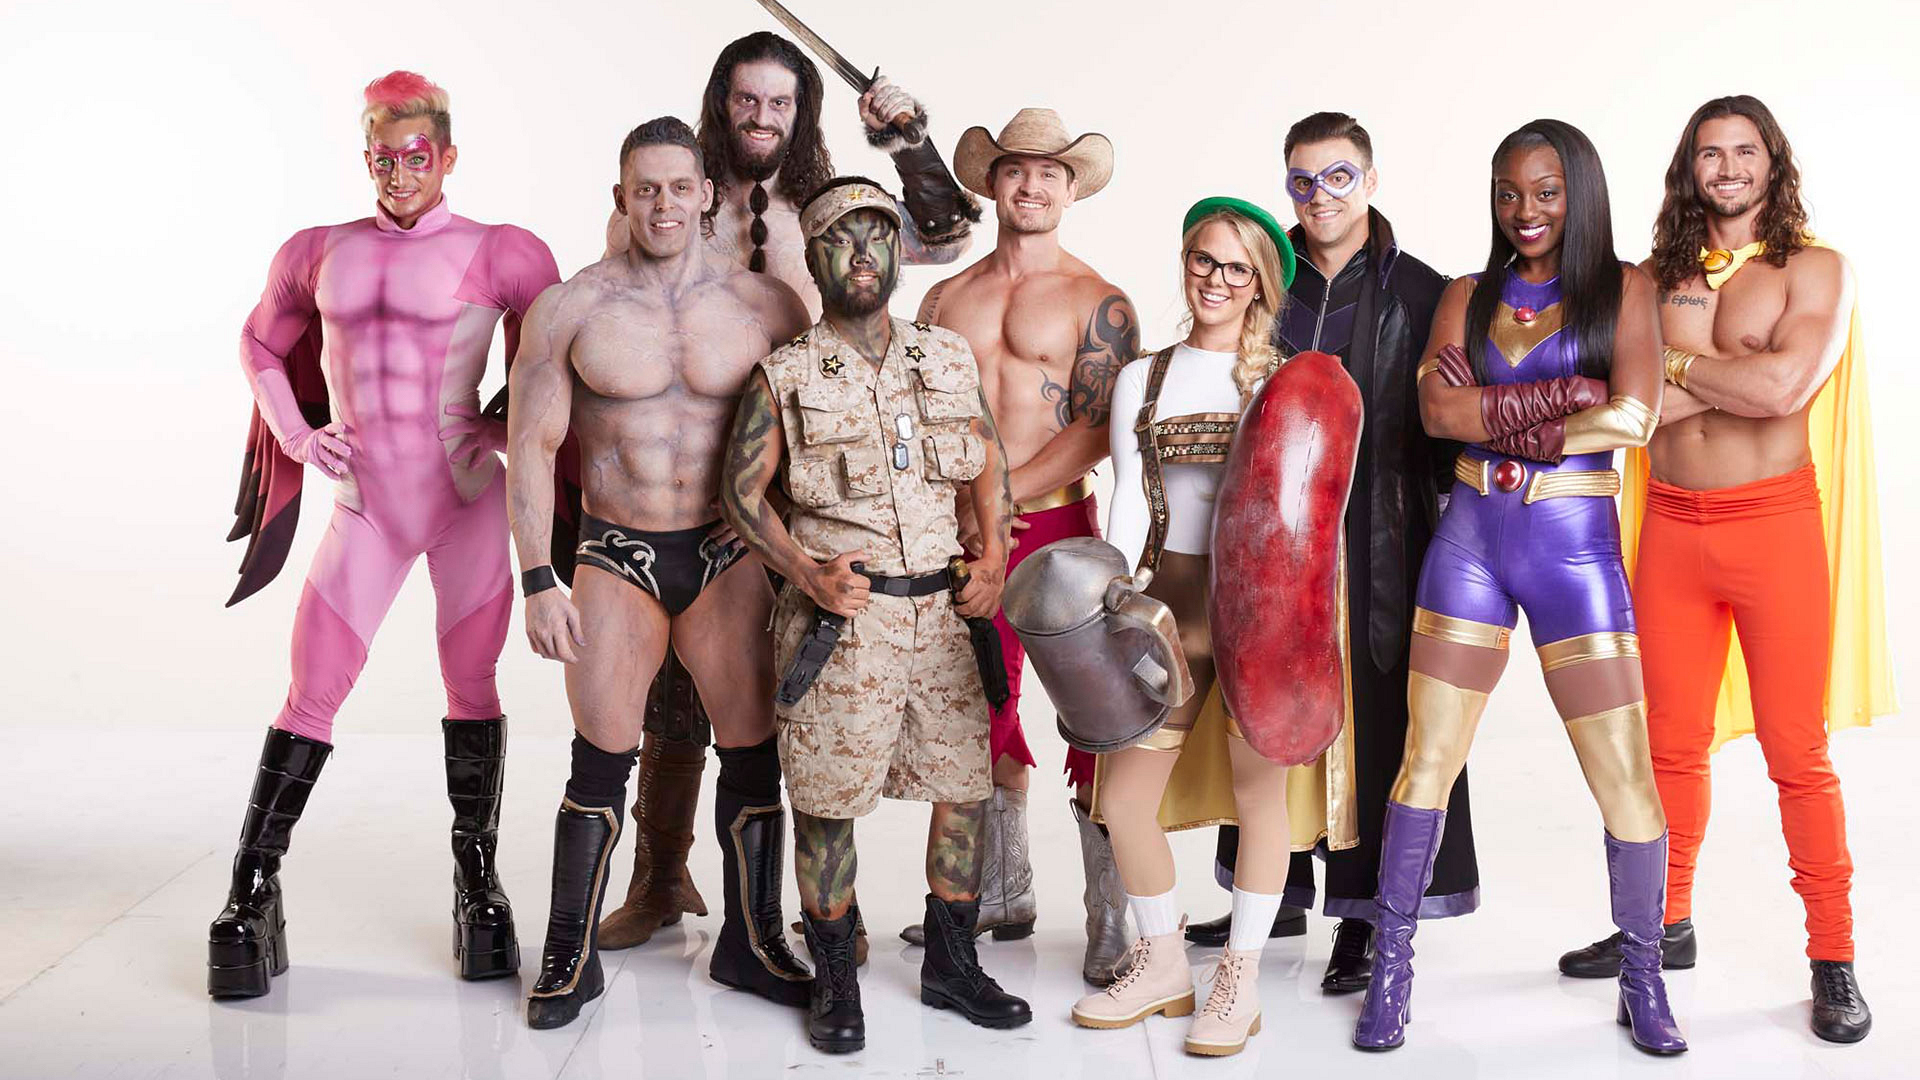 The world's greatest superhero squad?